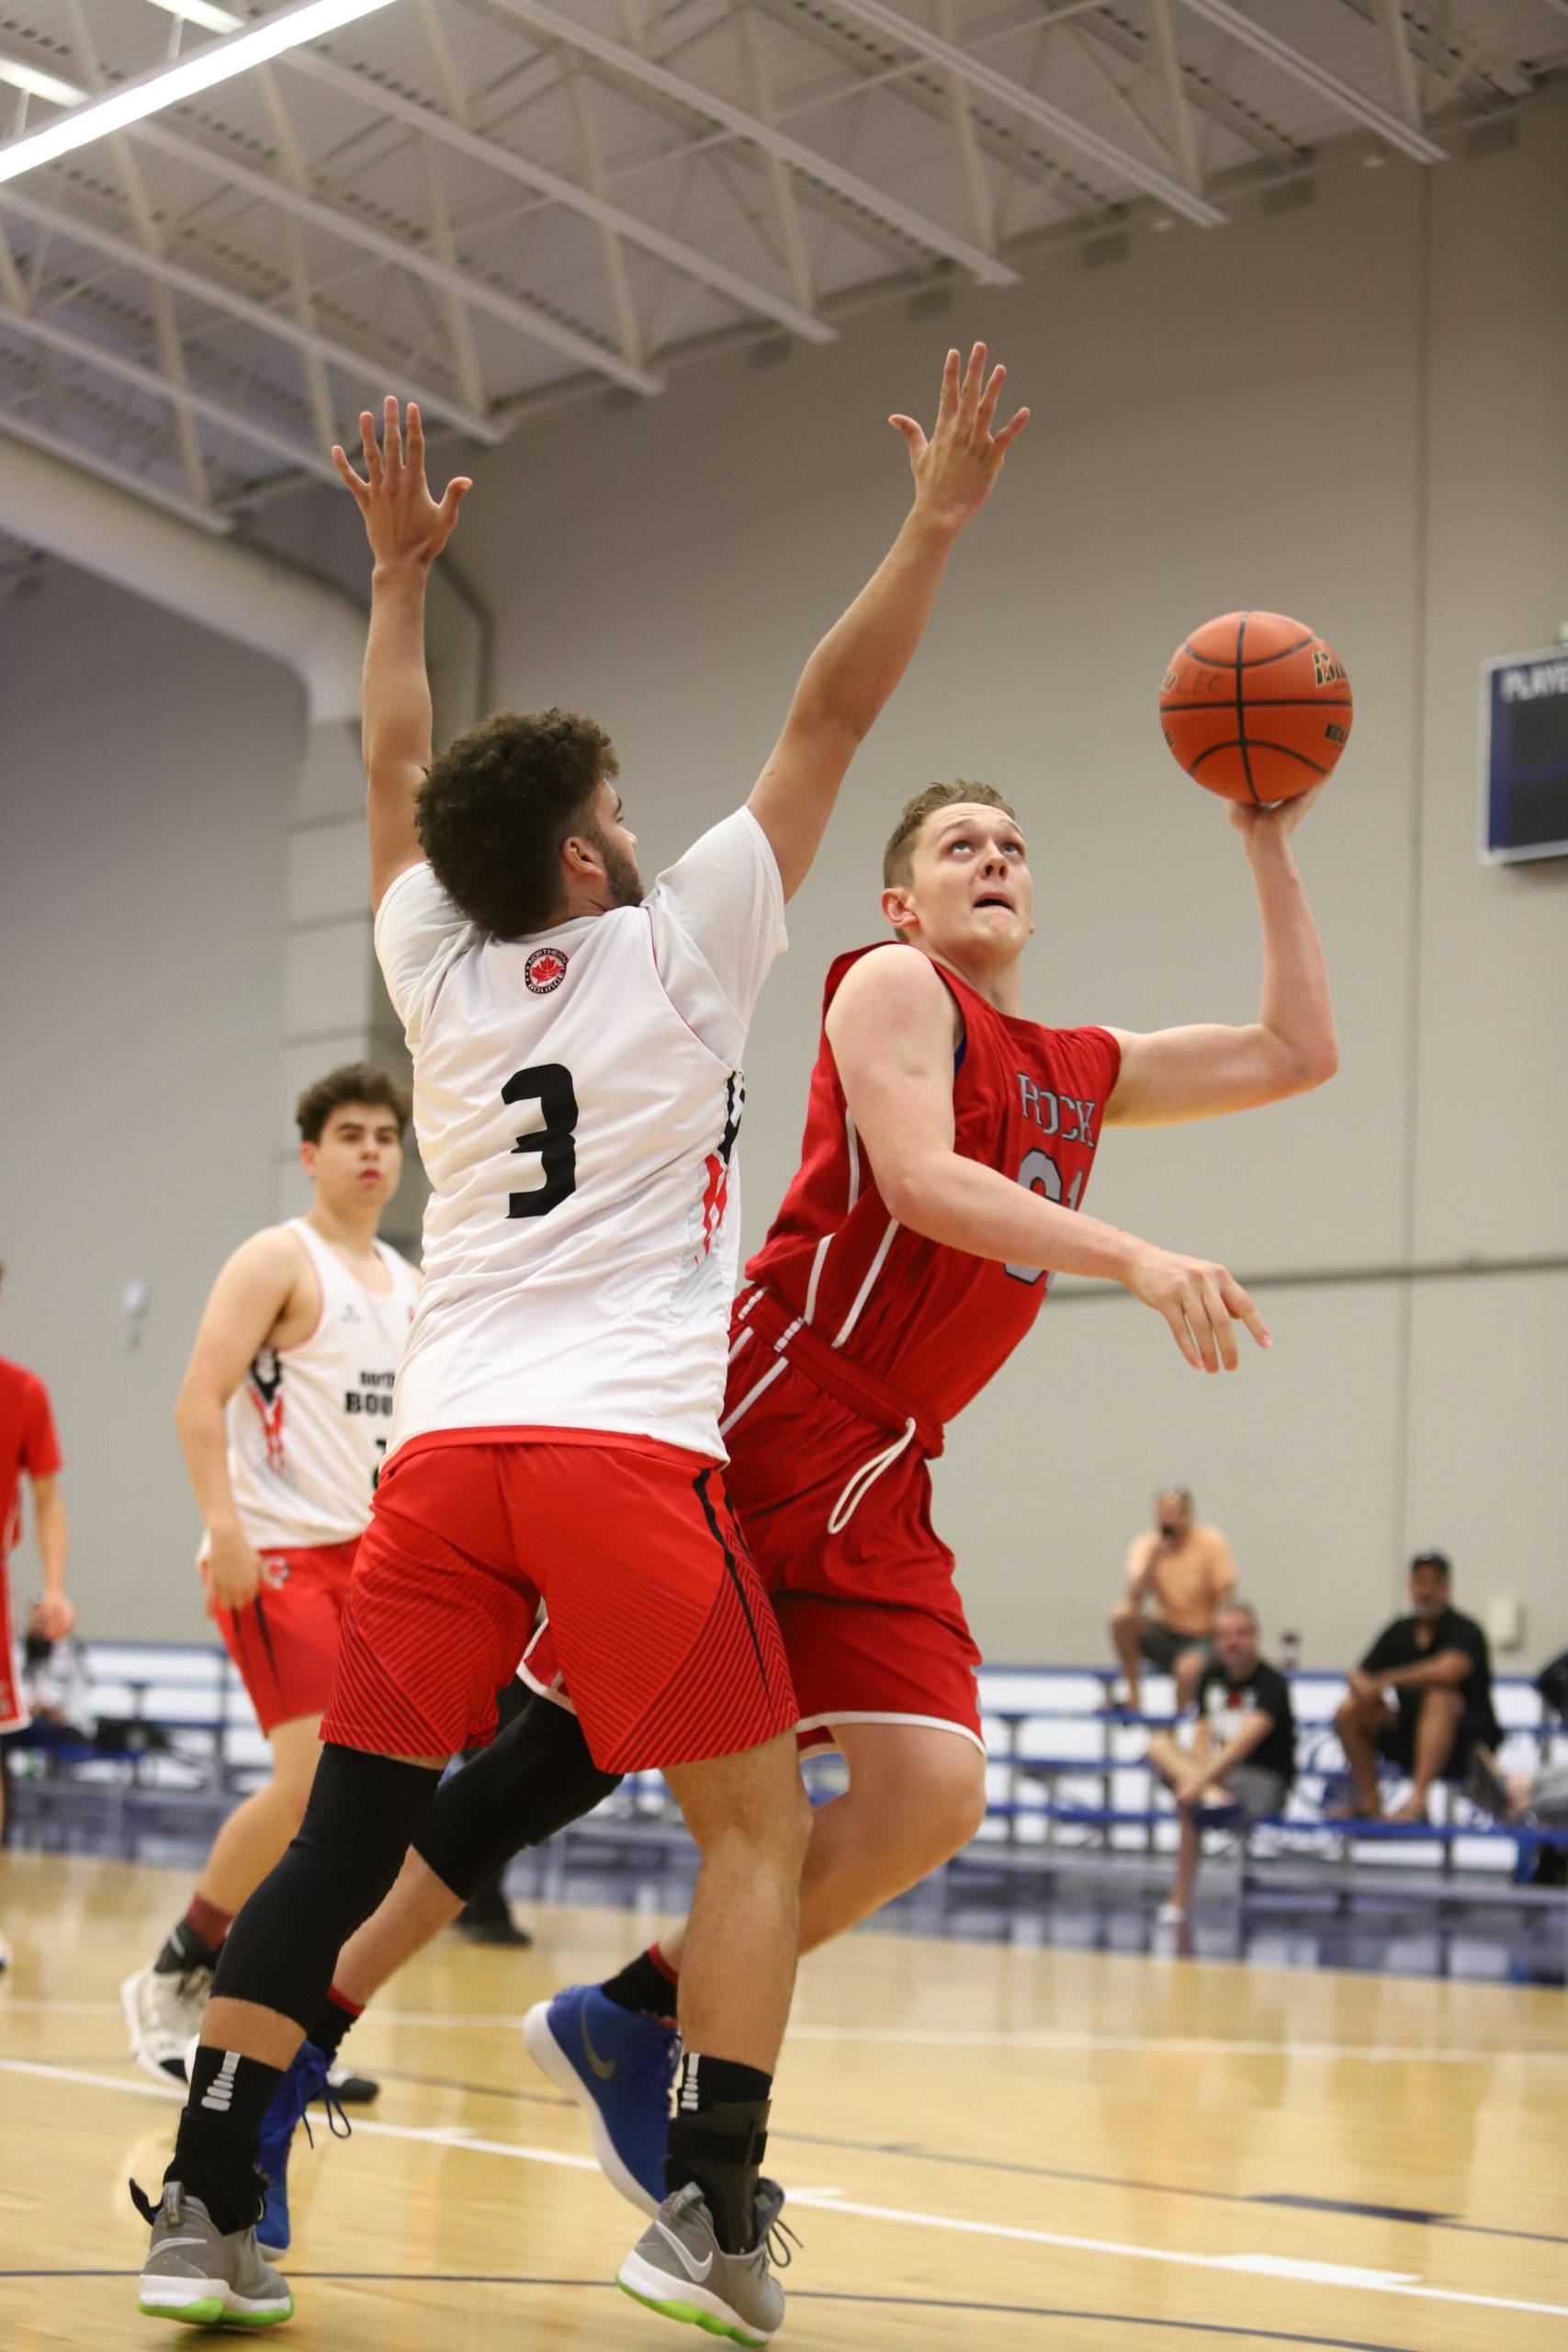 Bball Nationals 2019 (Boys U18) - Rock Elite Basketball Club